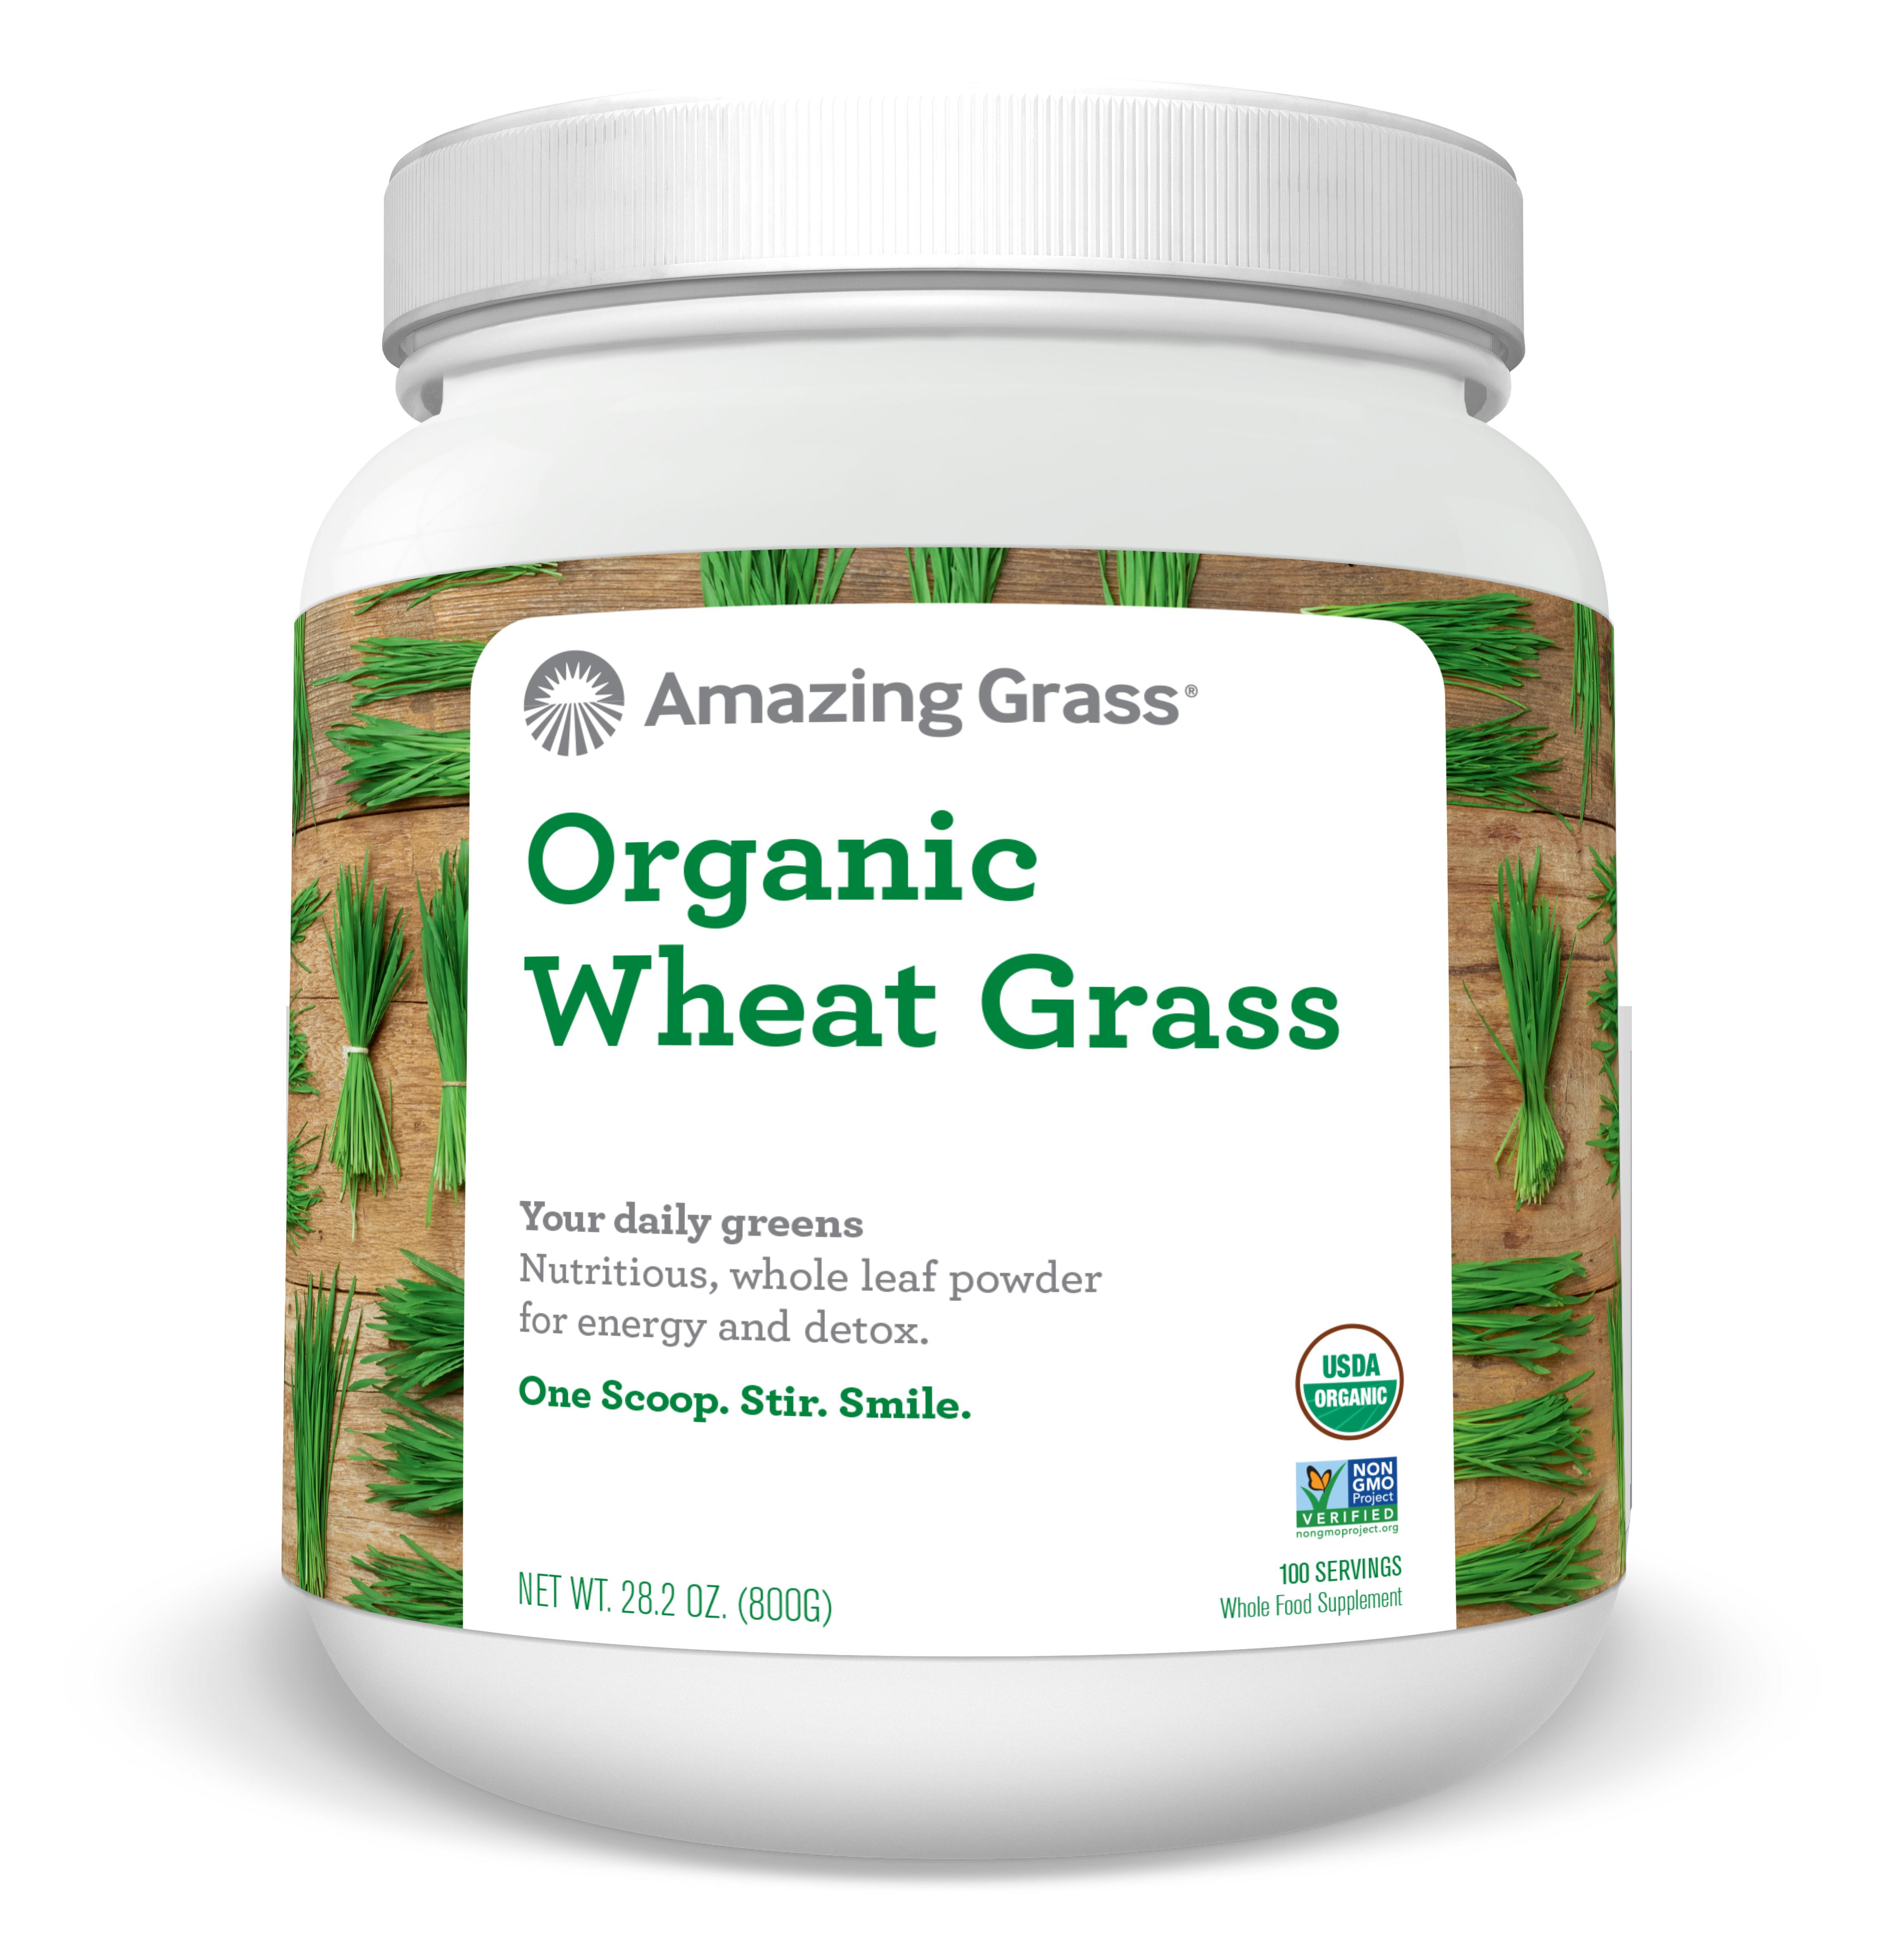 Moringa Herbs Of Gold Breastfeeding Support 60 Tablets